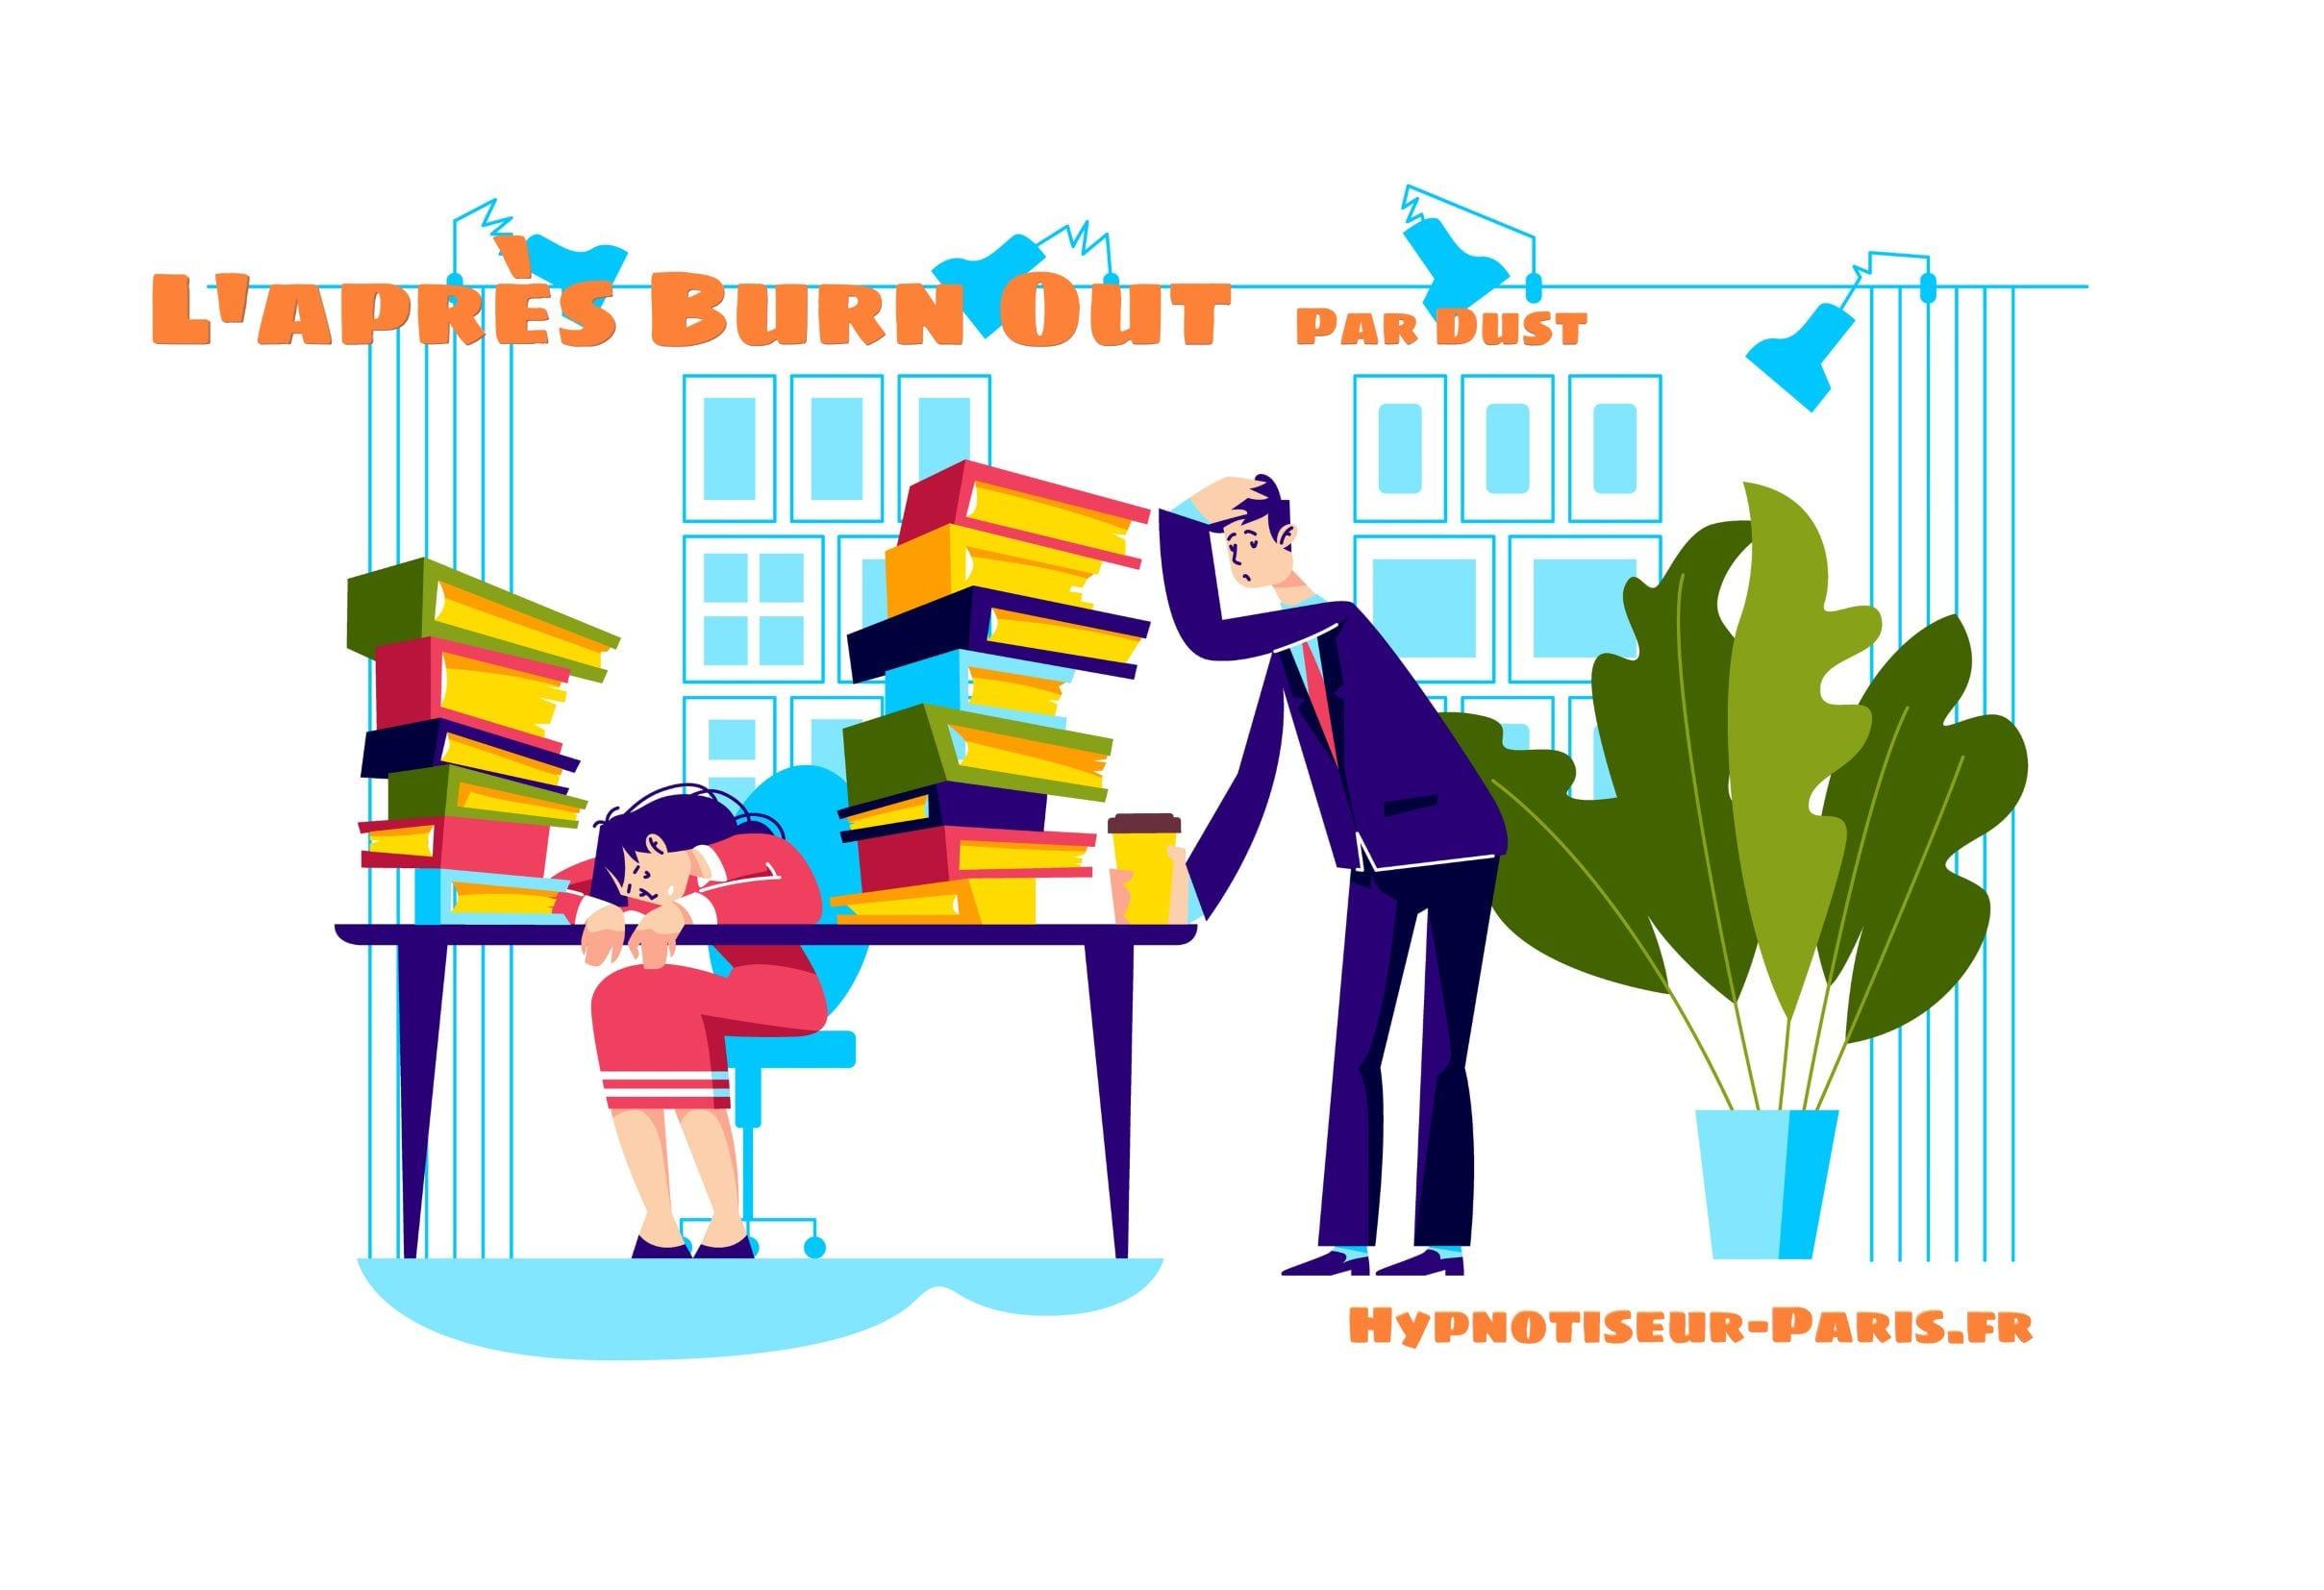 Shaff Hypnose Bourg-la-Reine - Apres BurnOut by Dust Le Burn Out Par Shaff Hypnose Bourg-La-Reine (92340)